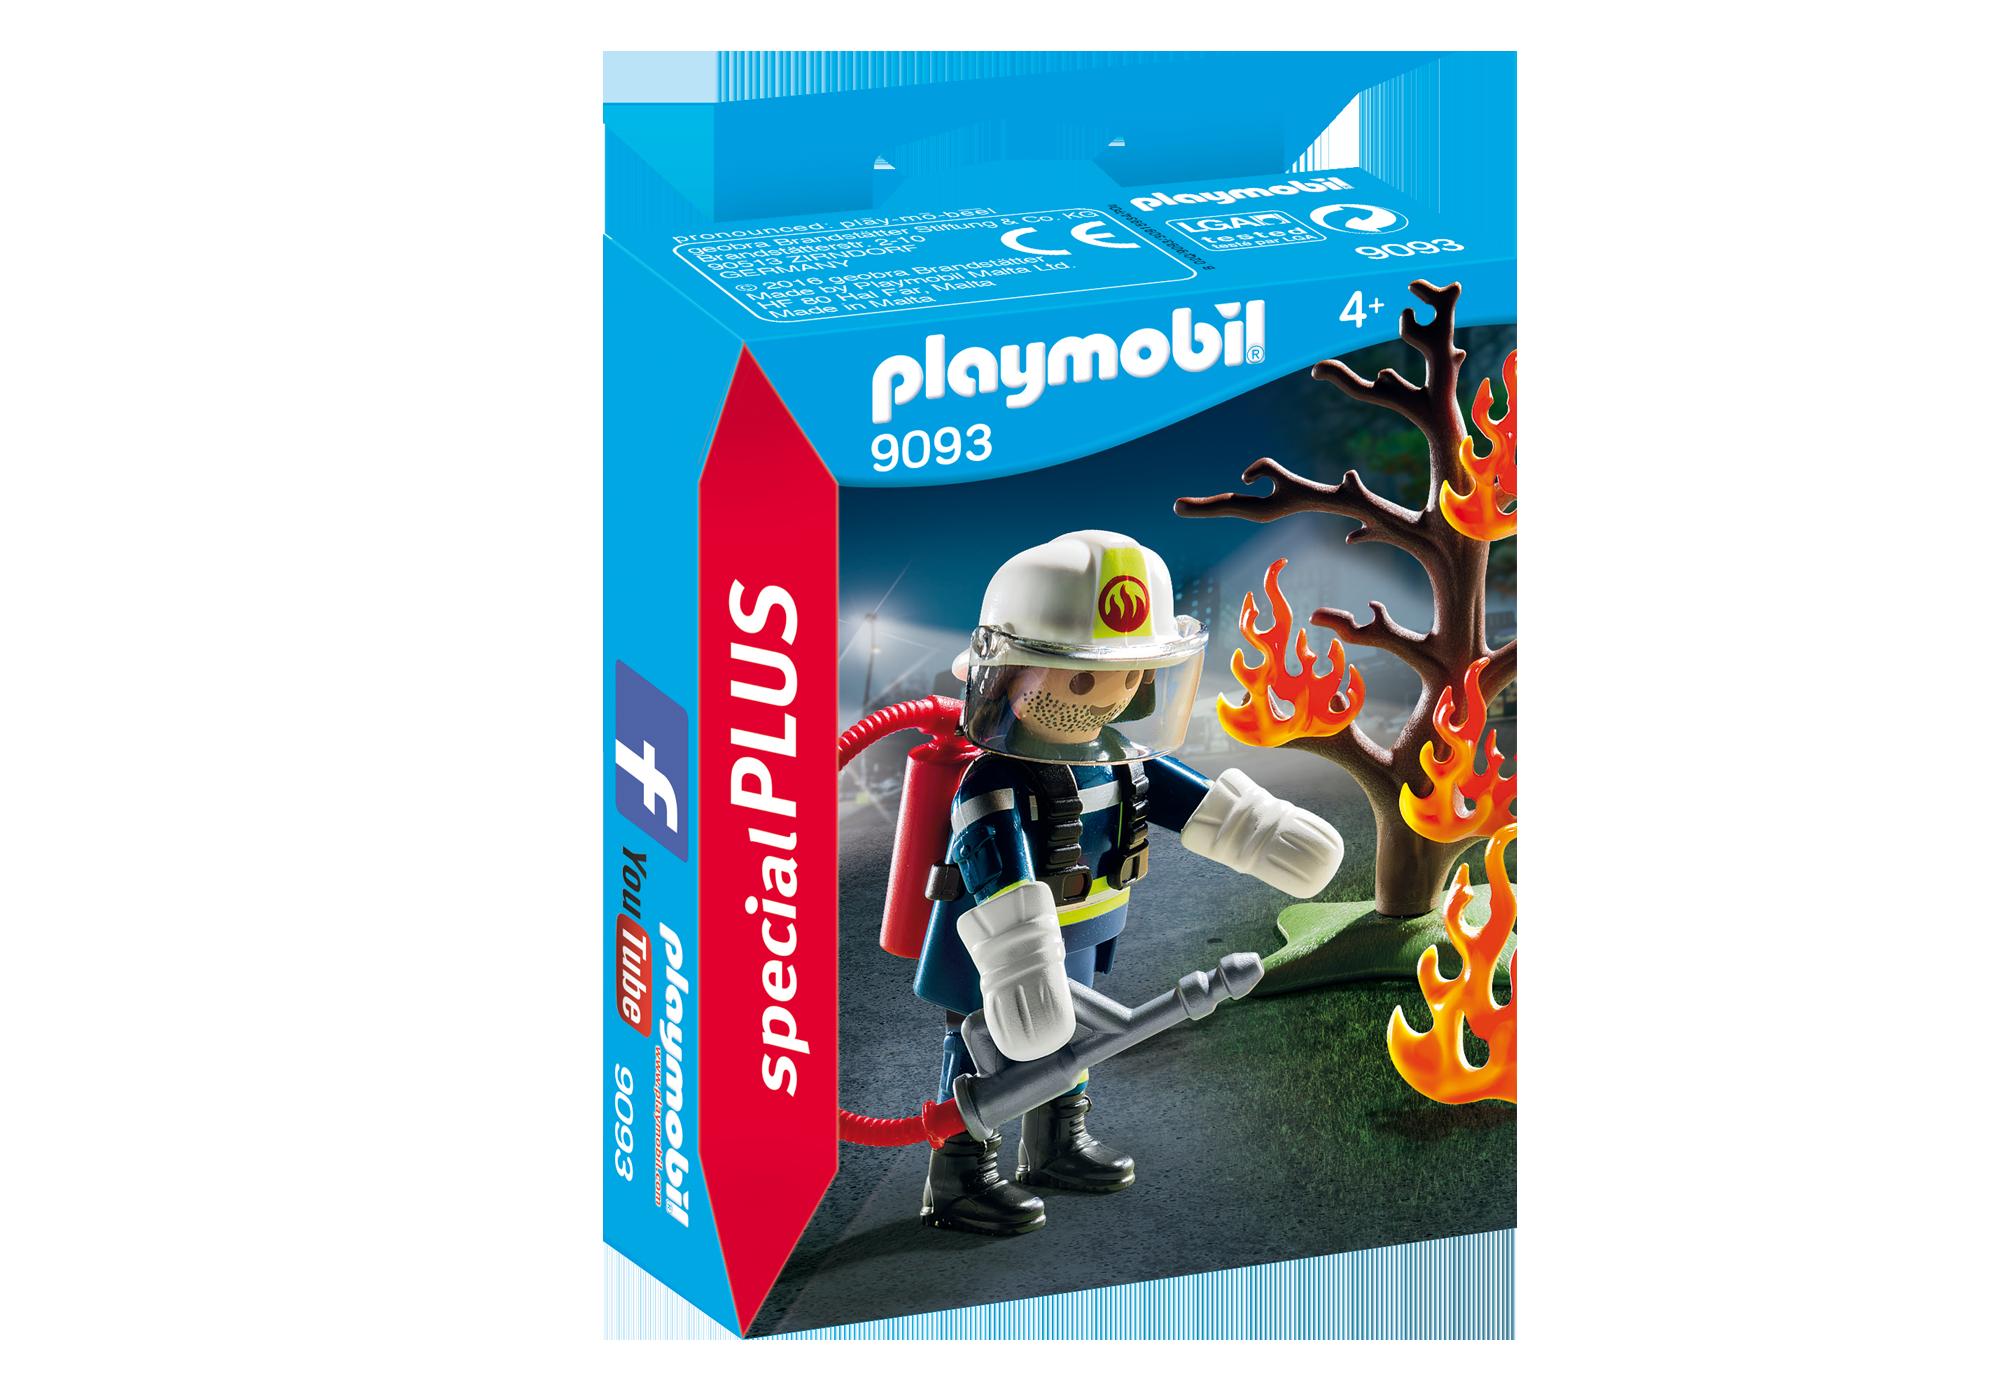 http://media.playmobil.com/i/playmobil/9093_product_box_front/Feuerwehr-Löscheinsatz